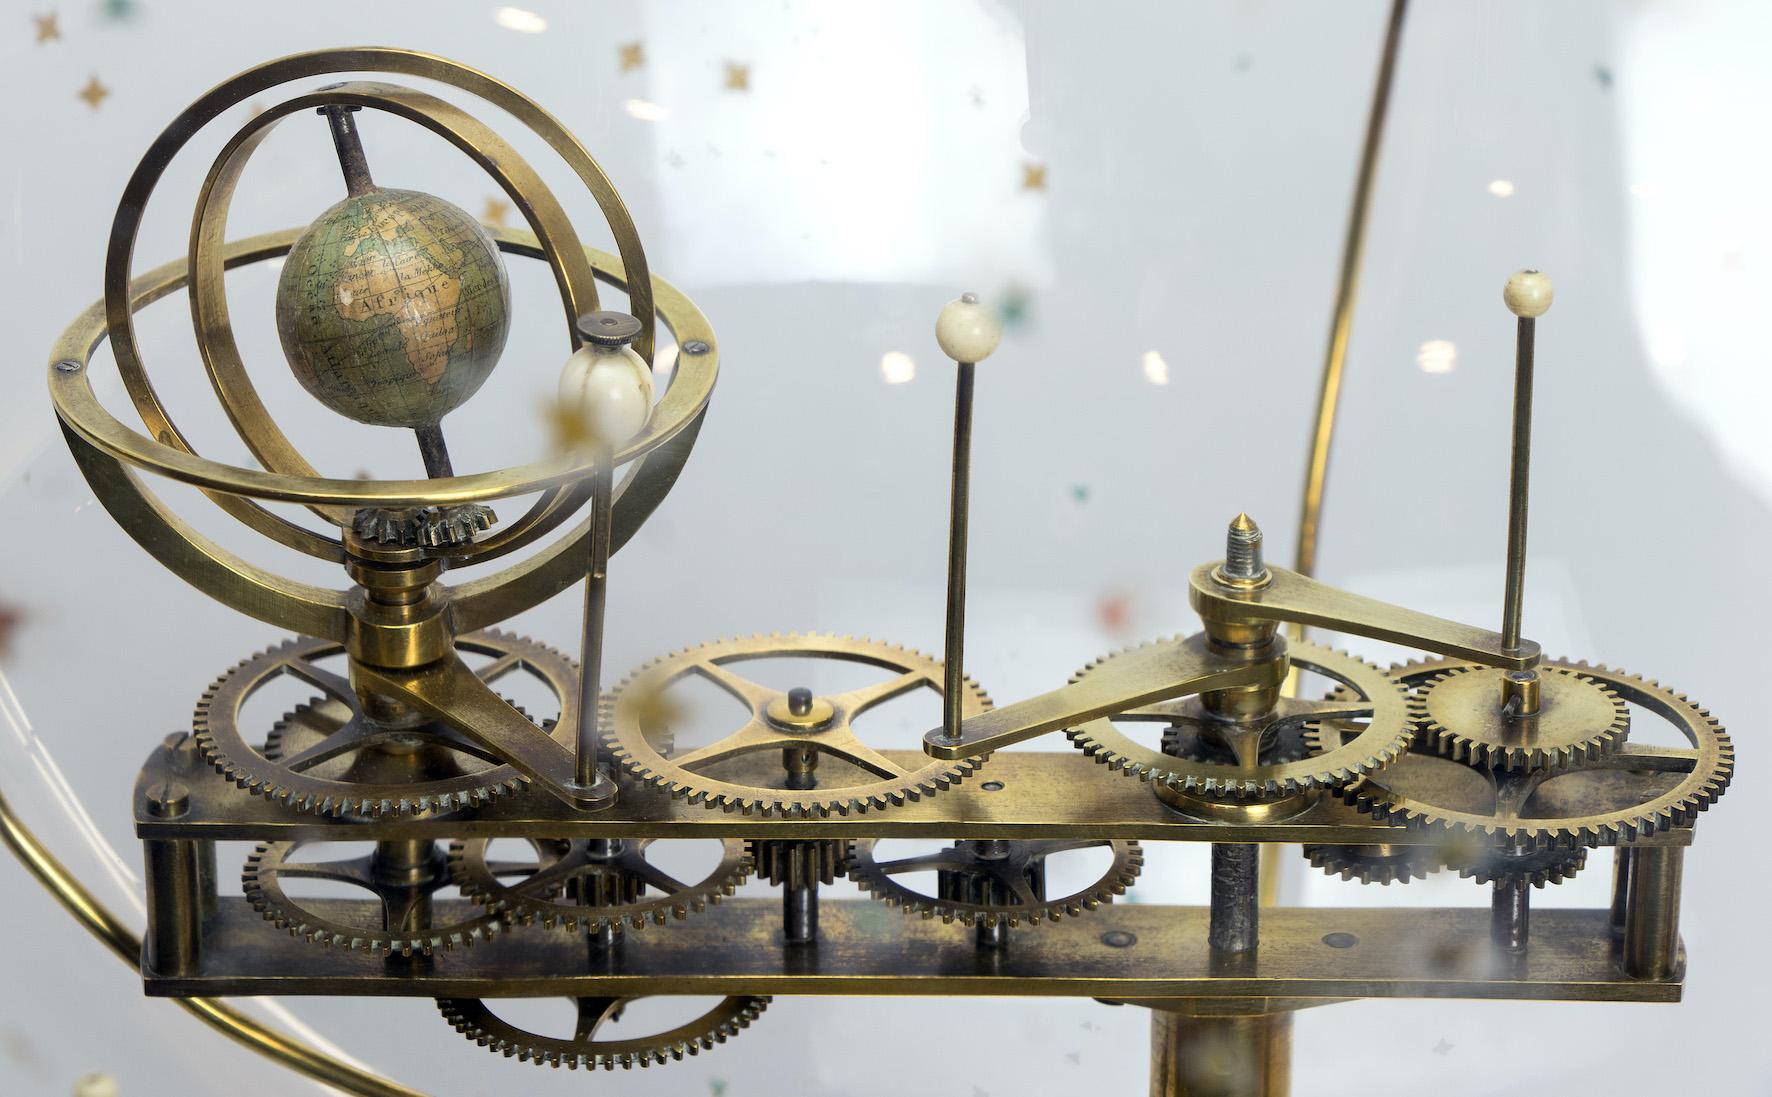 Dos gabinetes de ciencias dos institutos históricos aos clubs de ciencia e o STEMbach